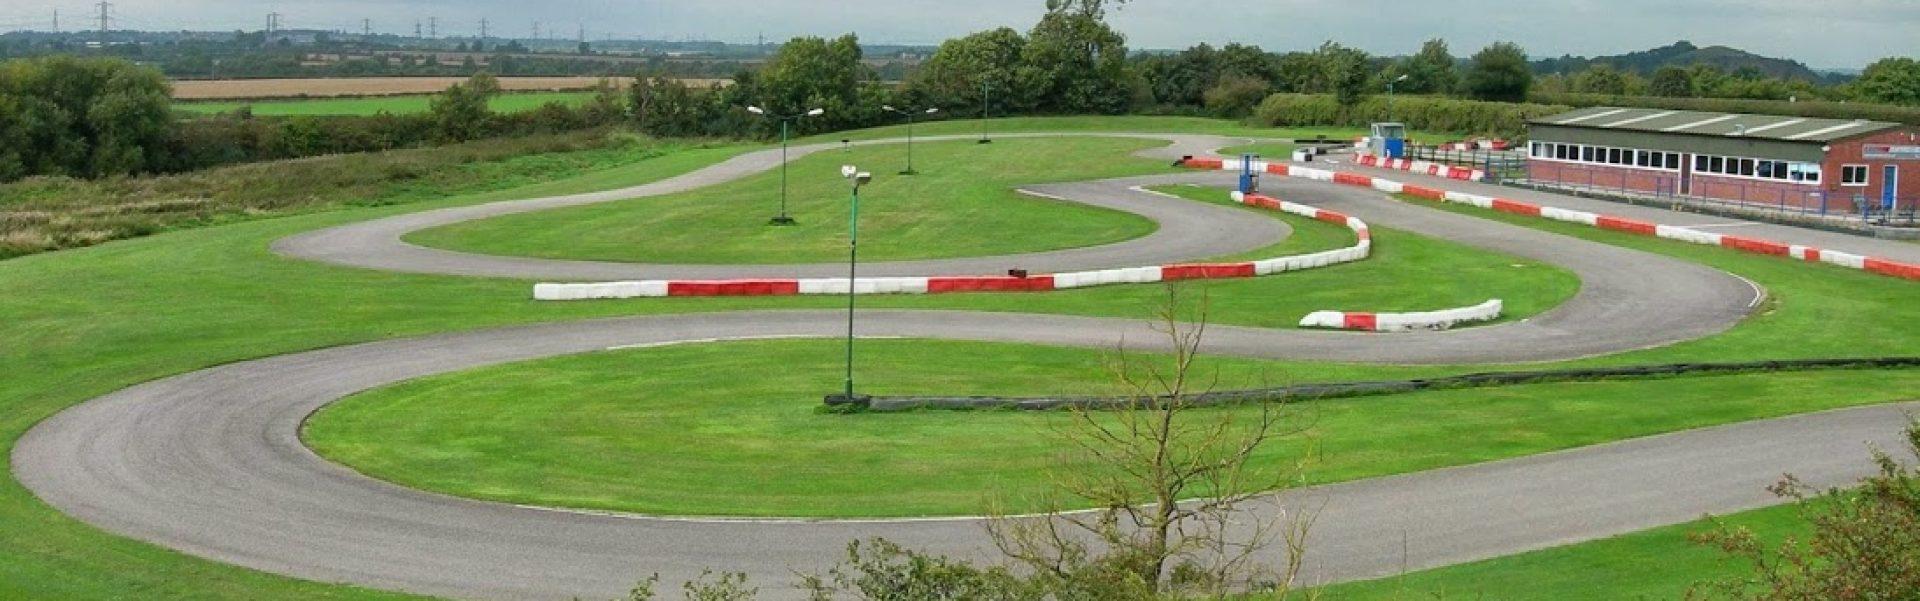 Sutton Circuit Go Karting Centre on Trip Advisor